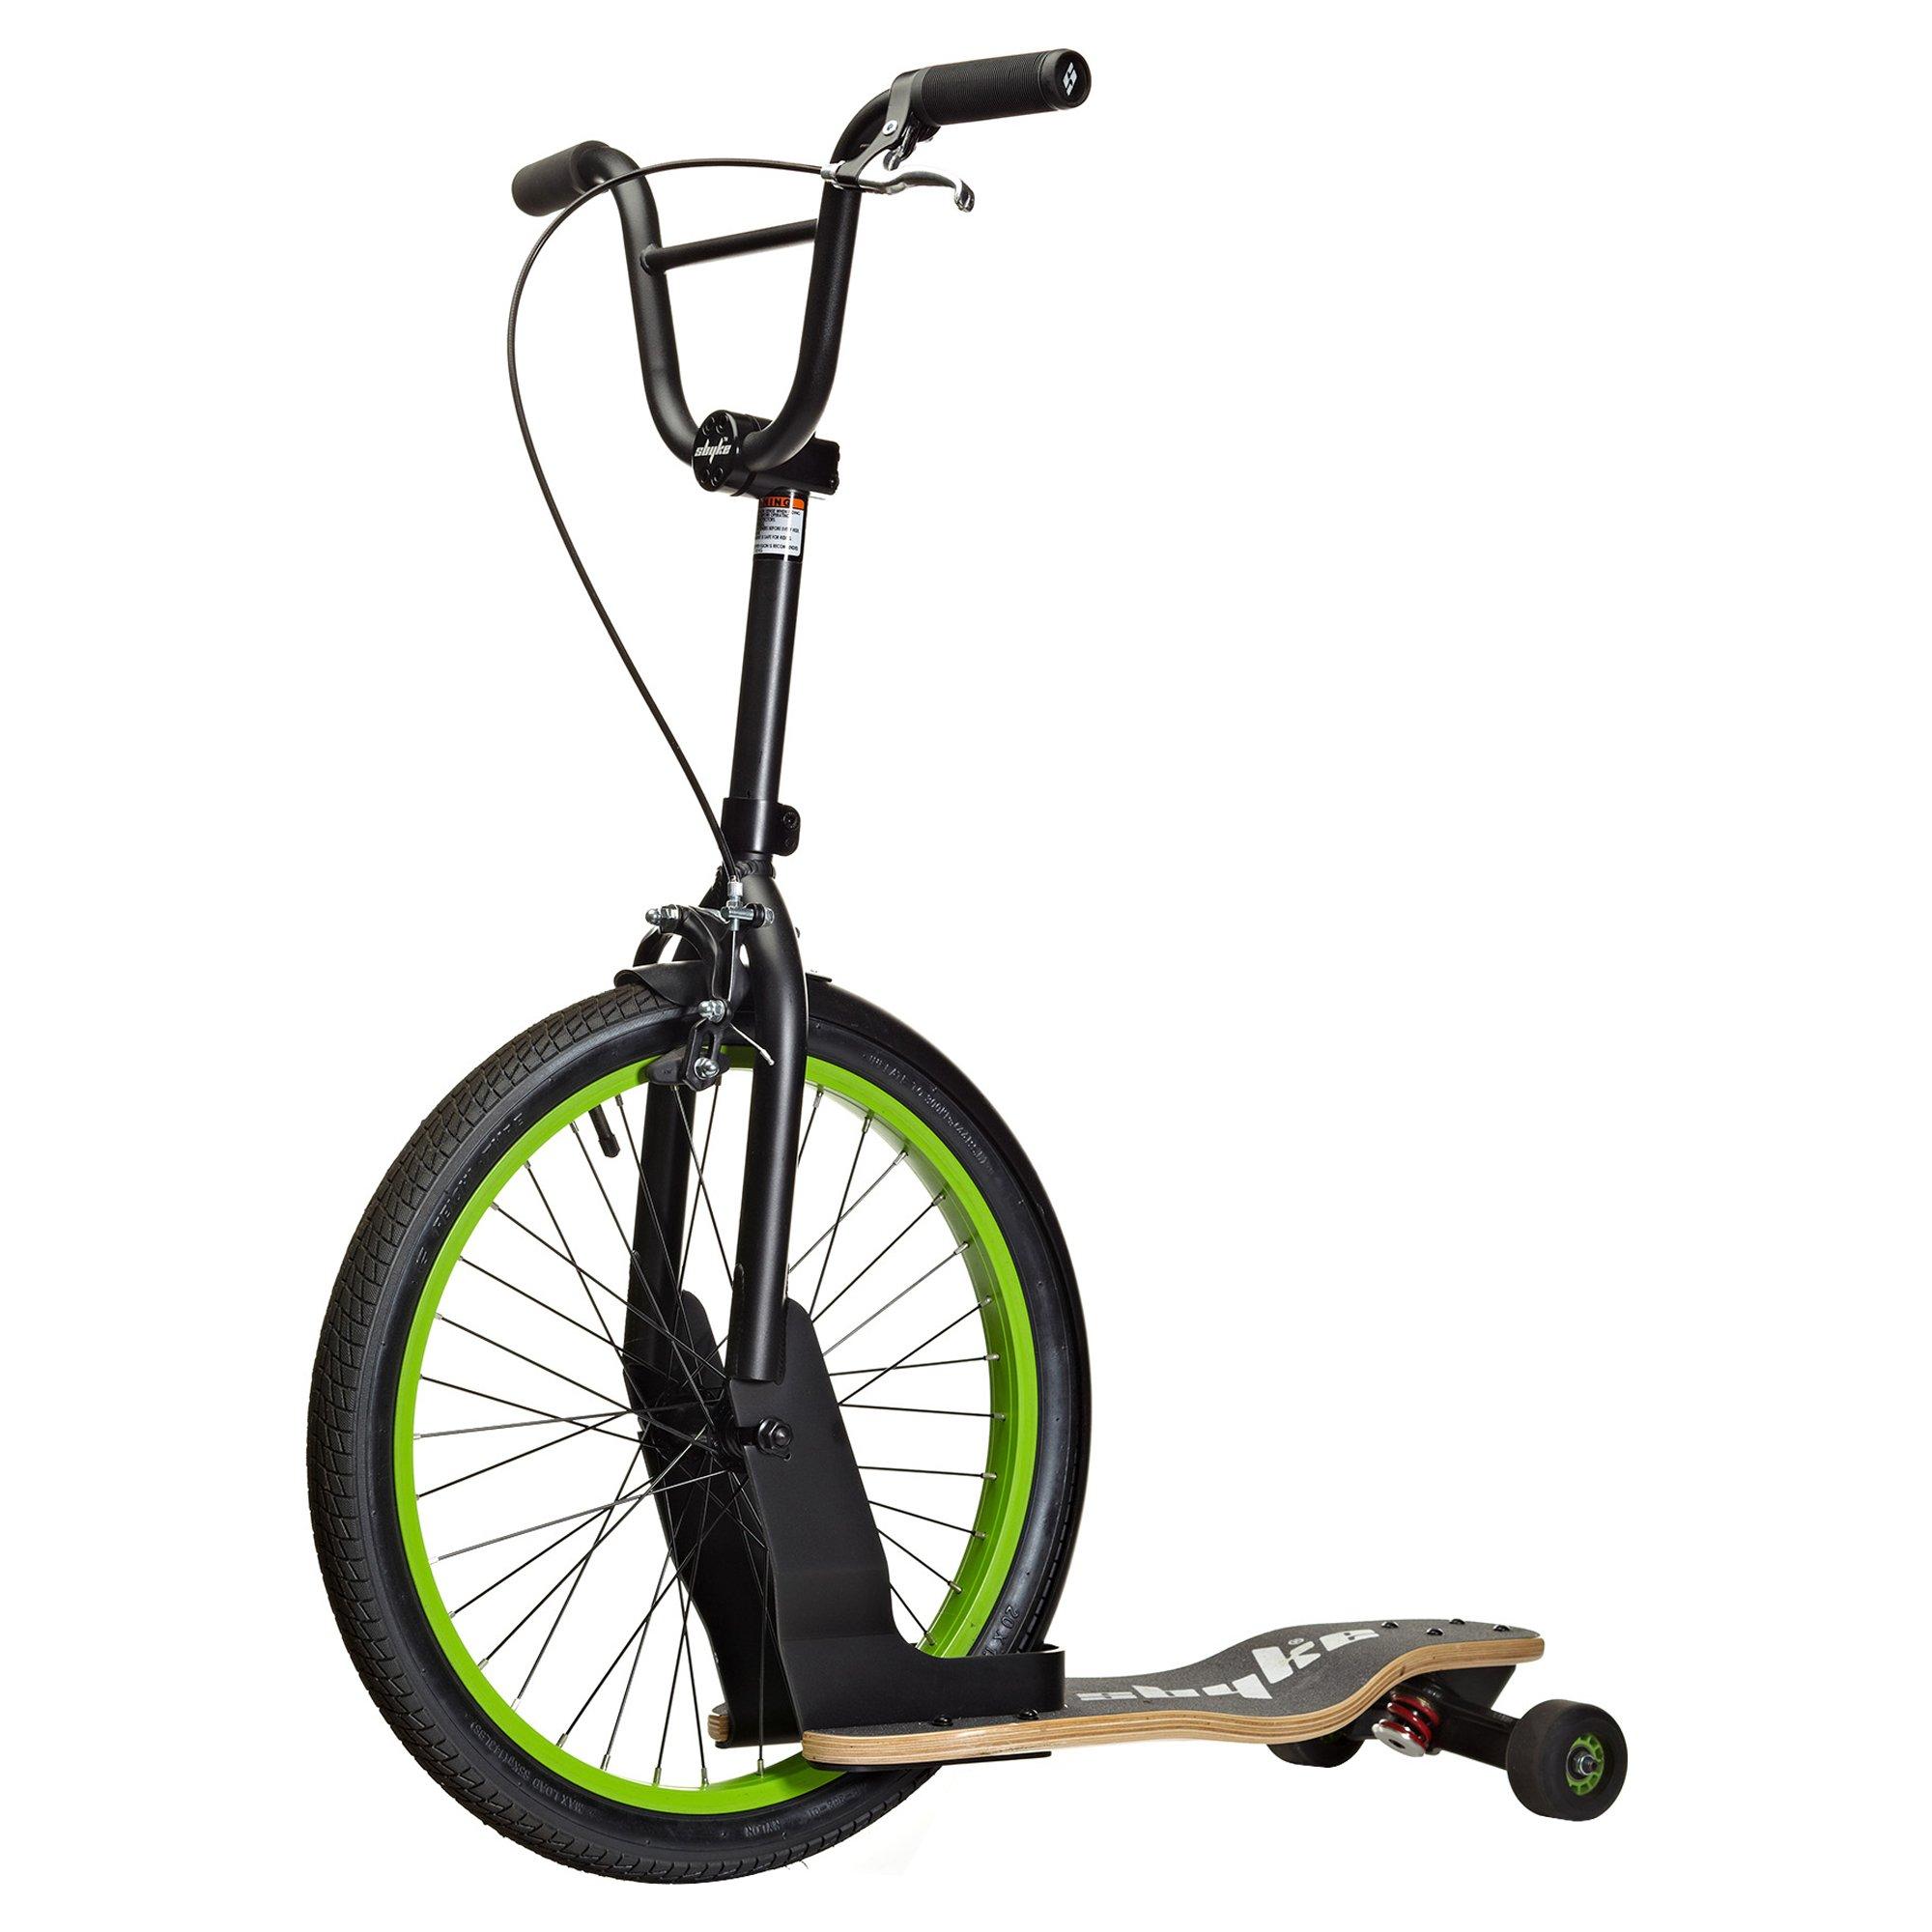 Sbyke Scooter for Kids and Adults: Coasts Like a Bike, Carves Like a Skateboard, patented Rearsteer technology by SBYKE